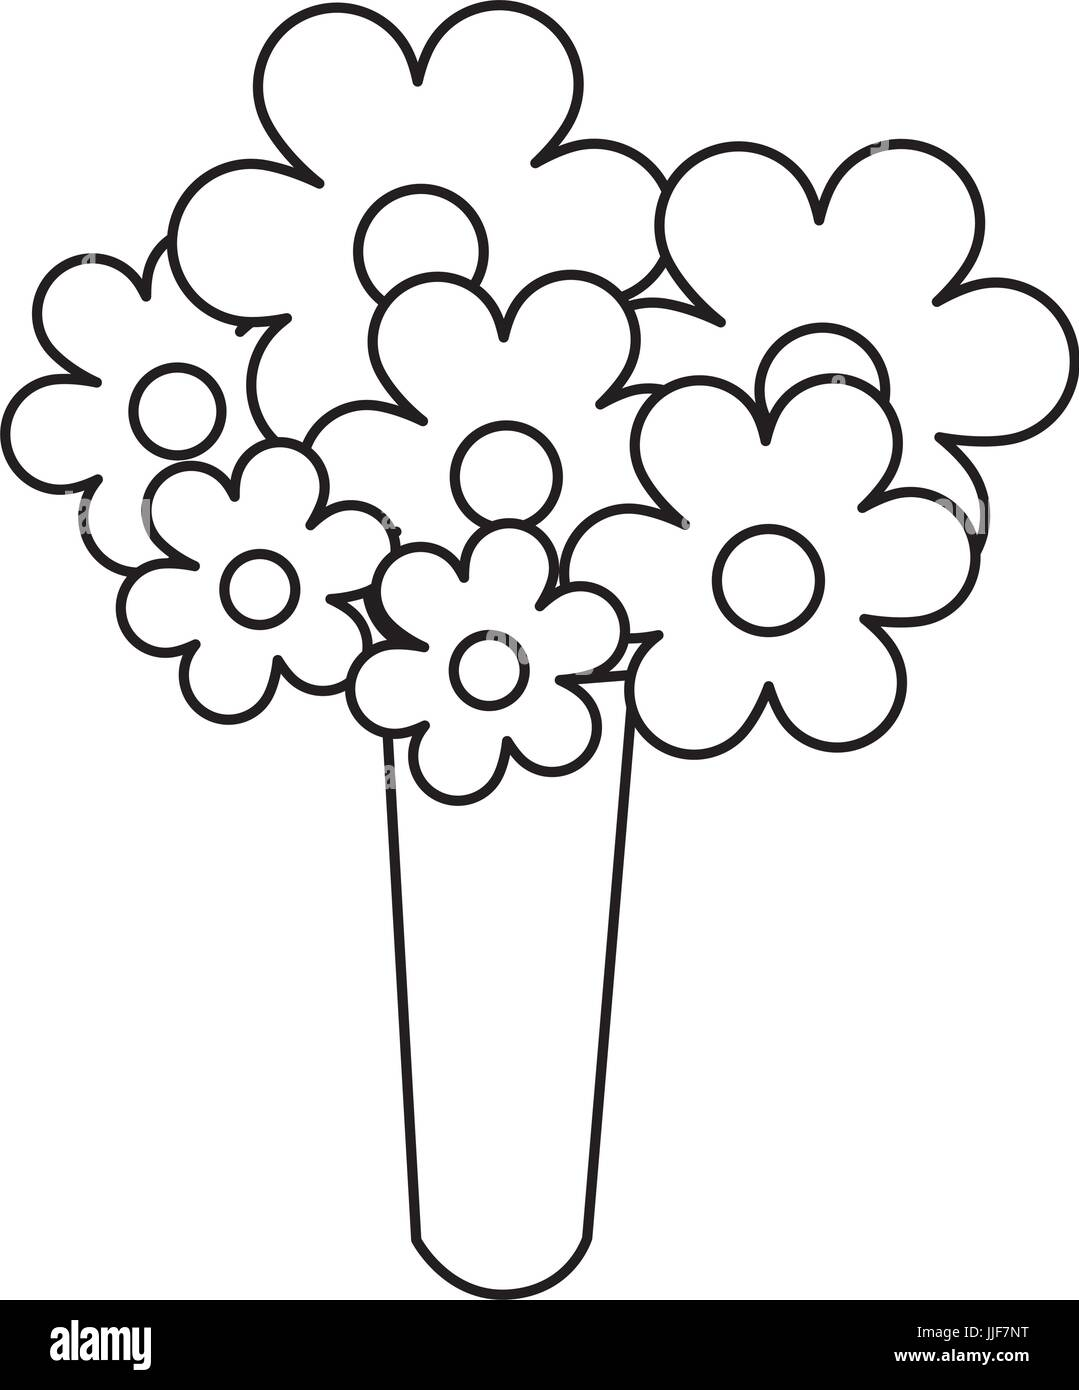 Bouquet Spring Flowers Cartoon Icon Black And White Stock Photos